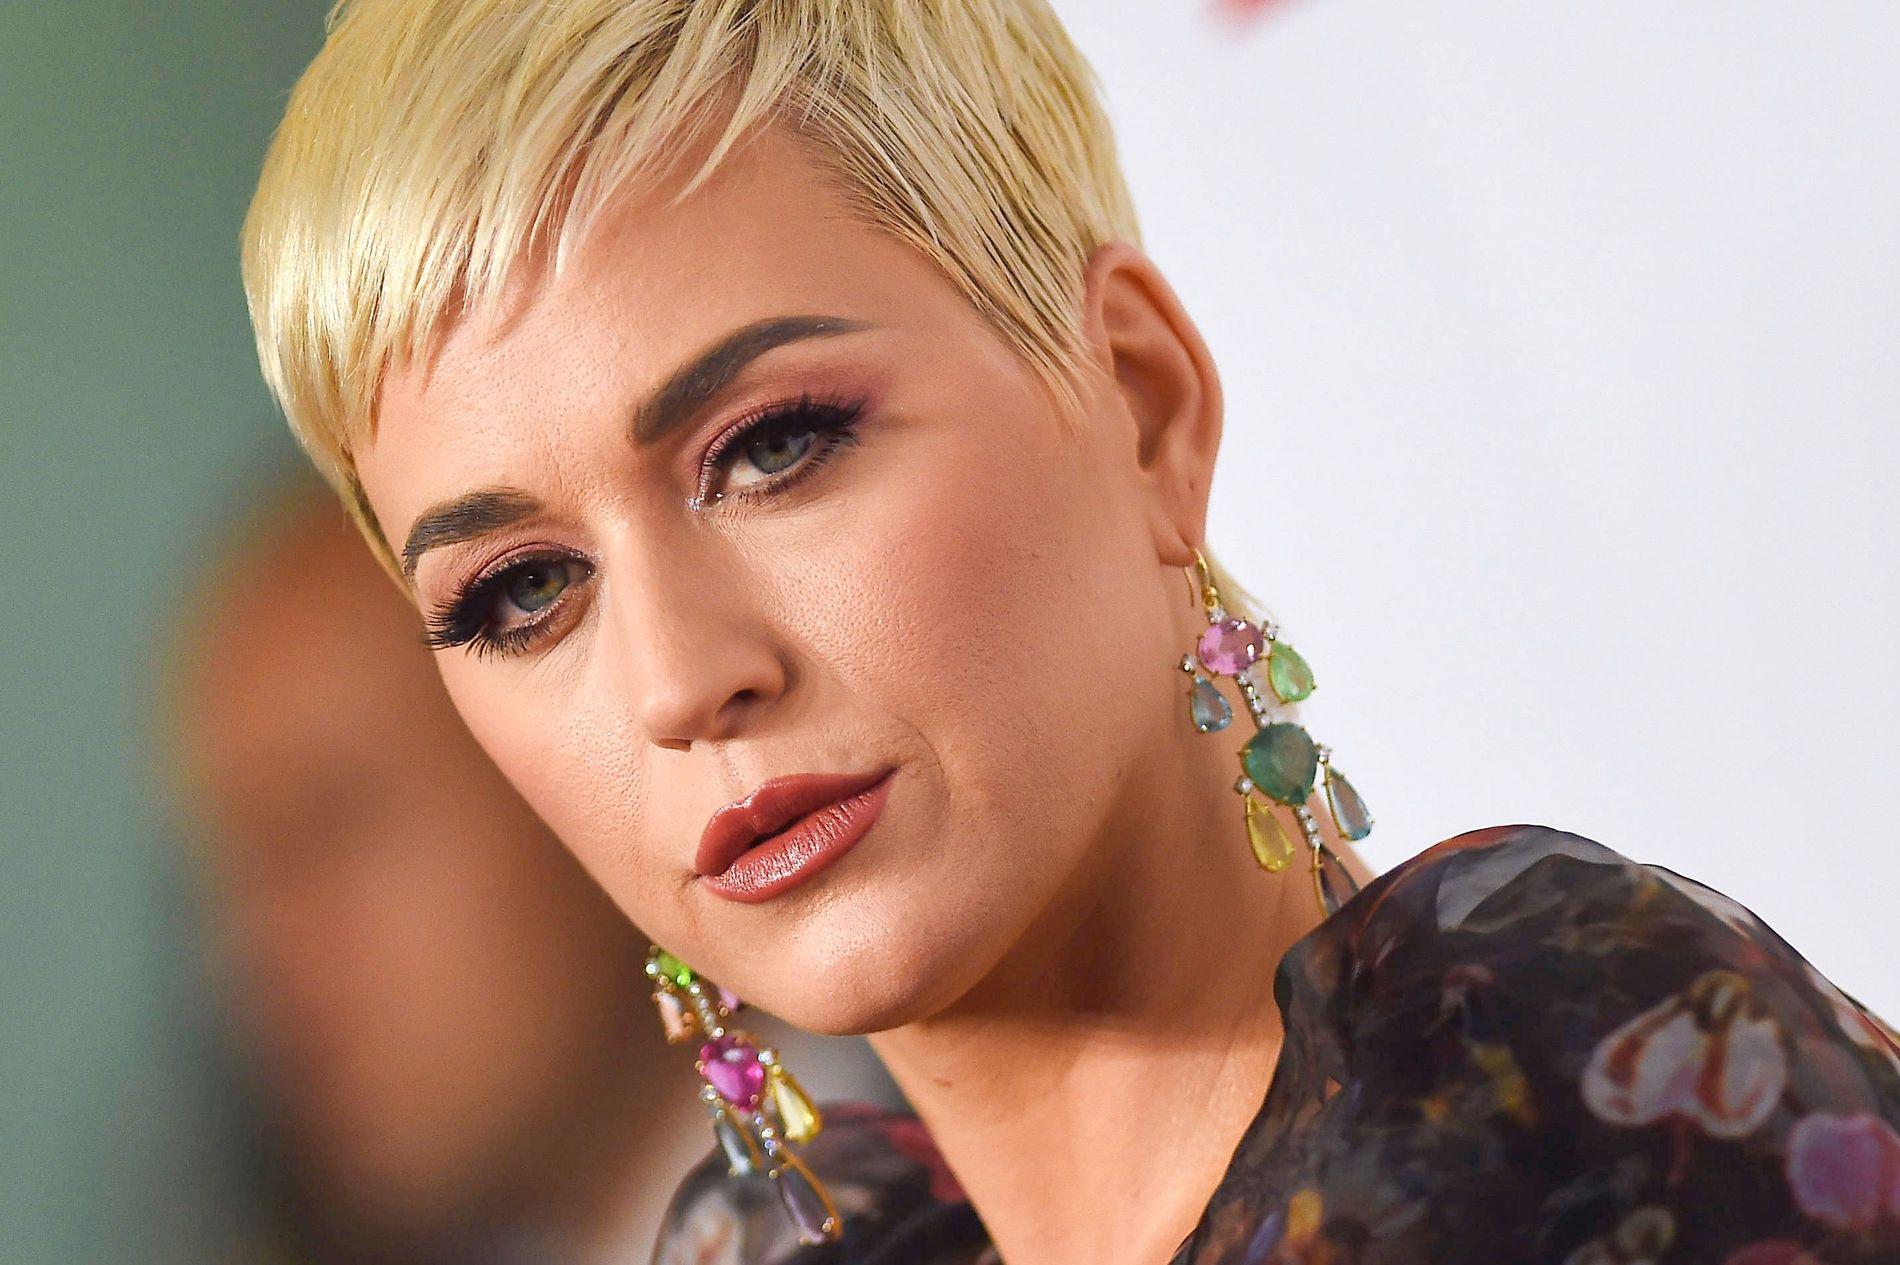 FÅR HARD SKYTS: Katy Perry, her under MusiCares Person Of The Year gala i Los Angeles i februar i år.